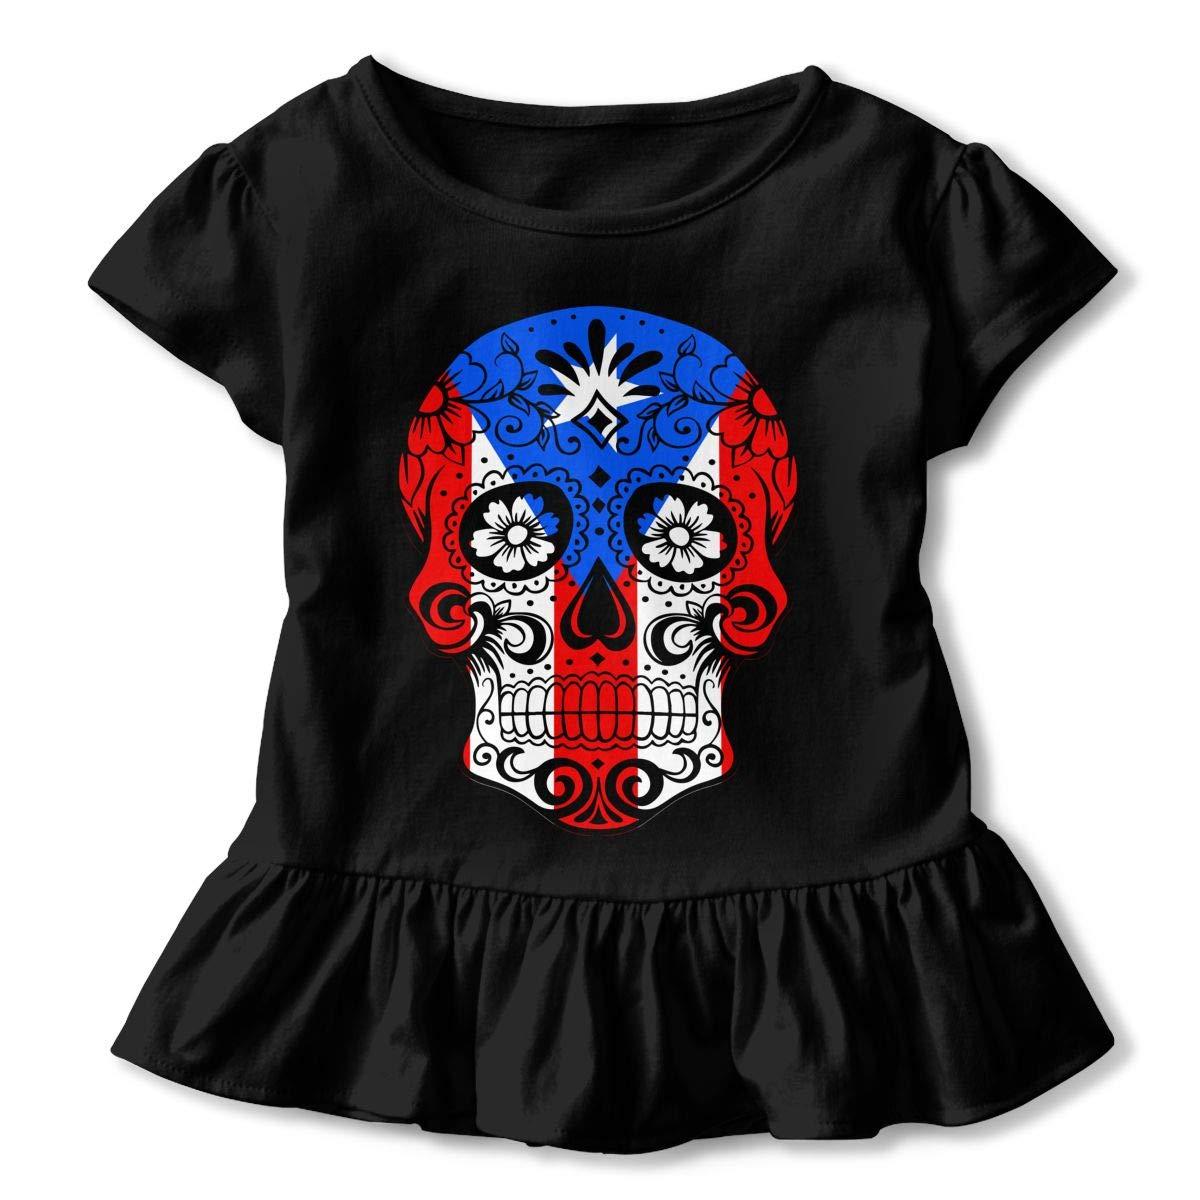 Puerto Rico Sugar Skull Toddler//Infant Girls Short Sleeve T Shirts Ruffles Shirt Tee for 2-6T